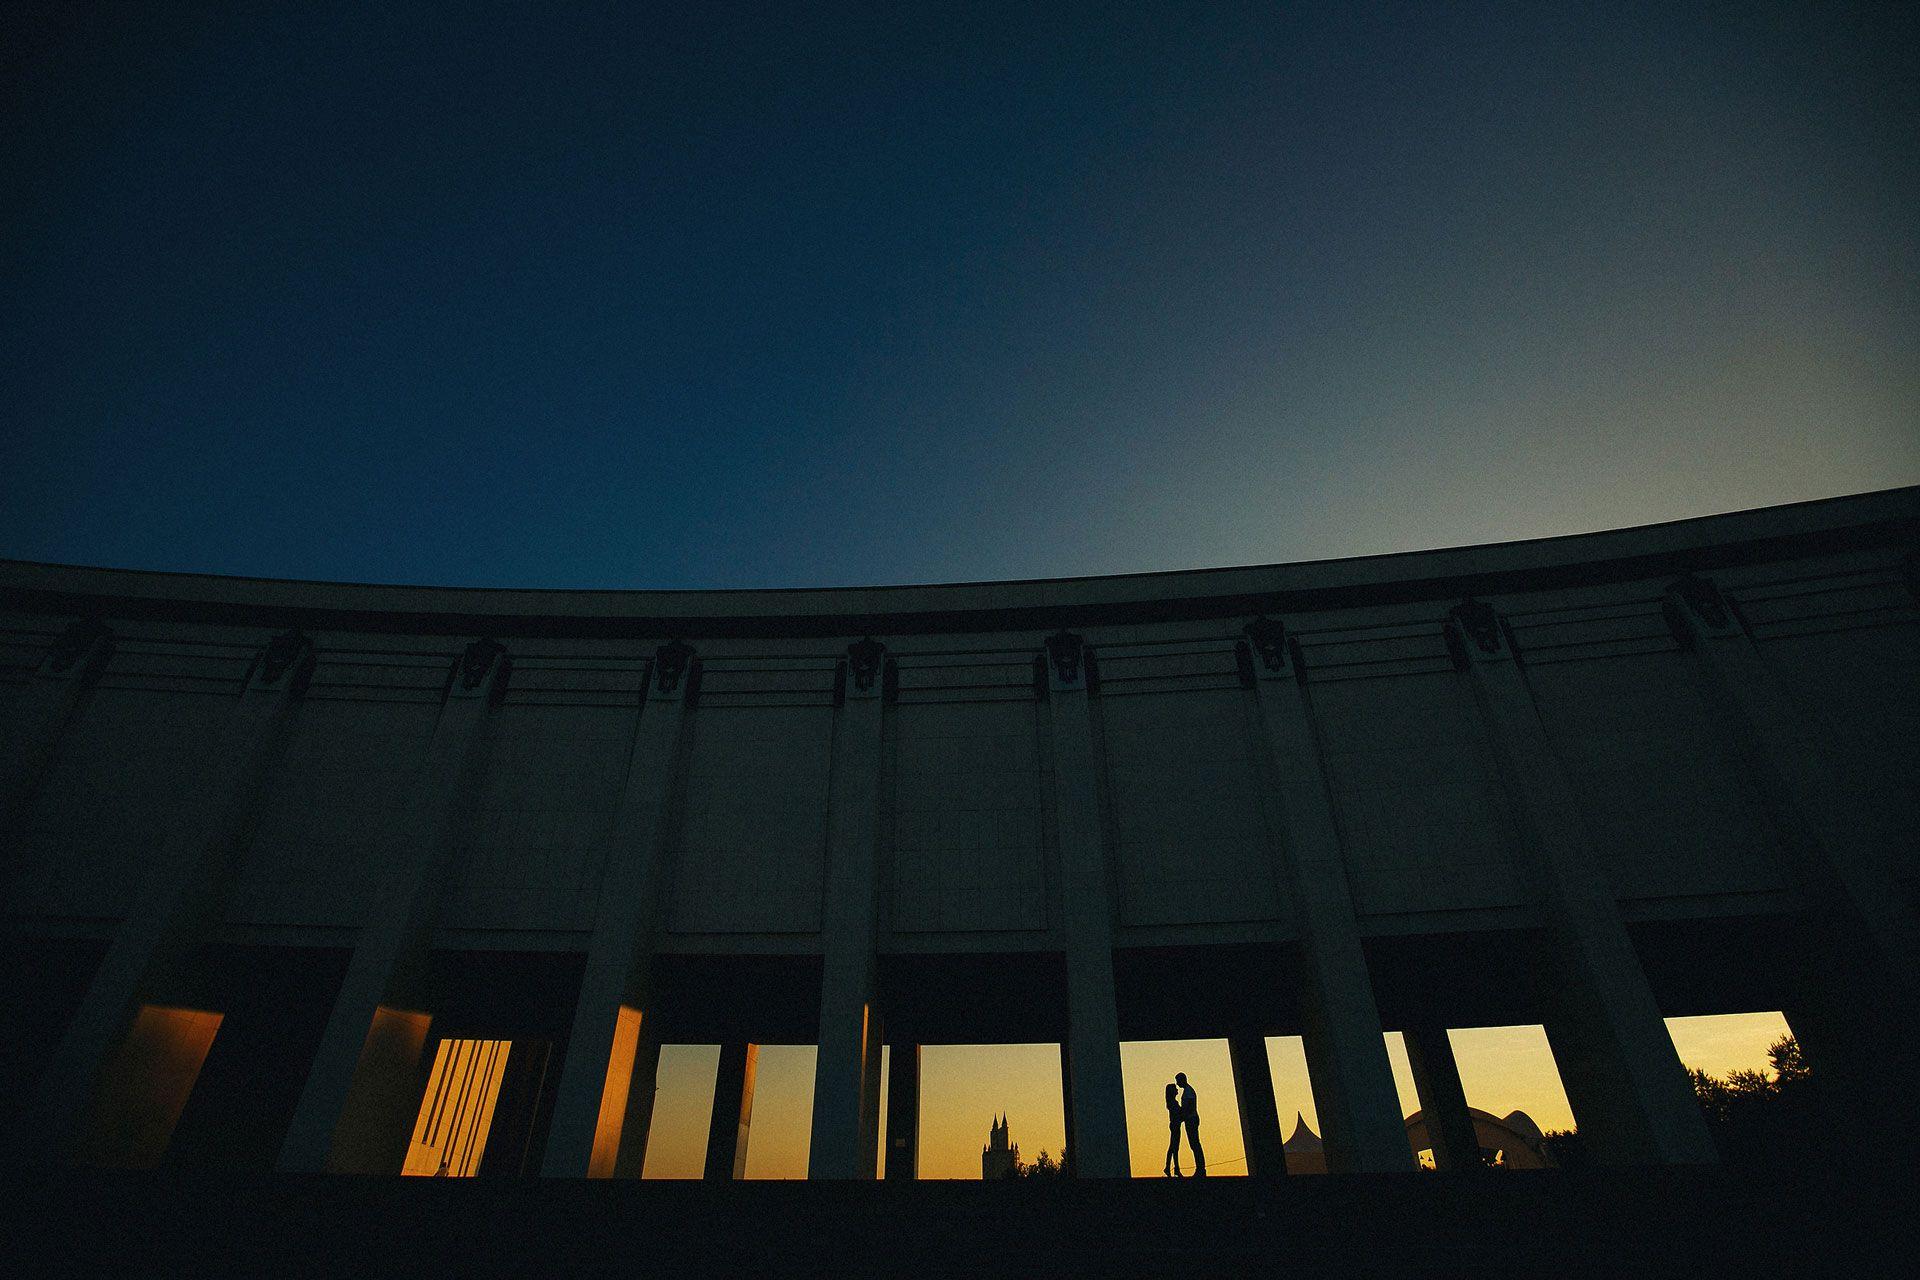 Фотографии Дмитрия Горбунова: минимализм и простота форм, фото 6